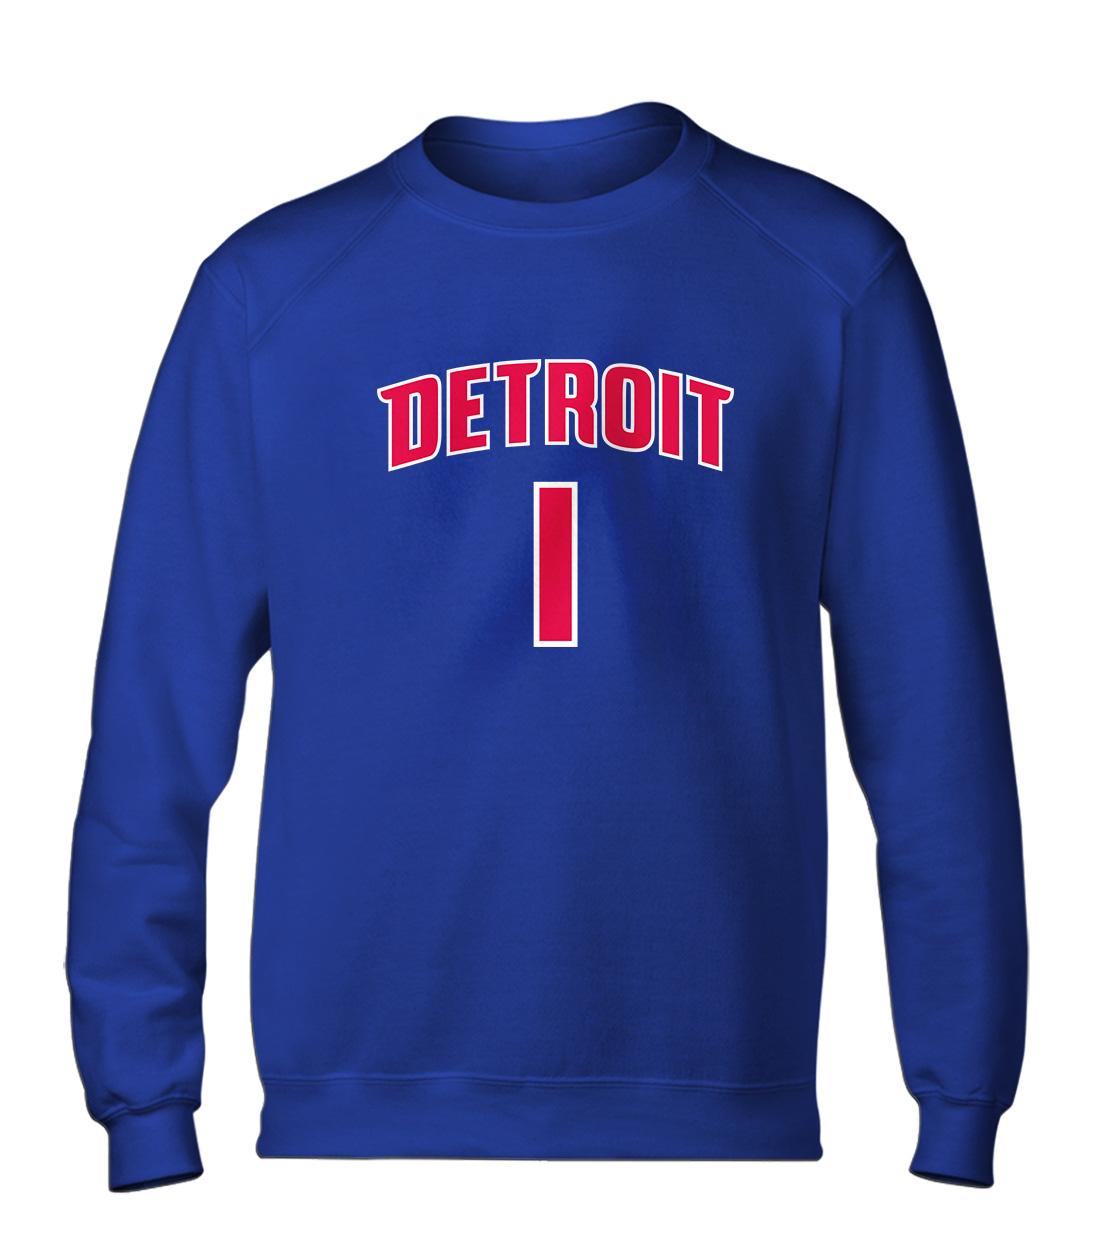 Detroit Pistons Chauncey Billups Basic (BSC-BLU-NP-75-PLYR-DET-BILLUPS.FRM)